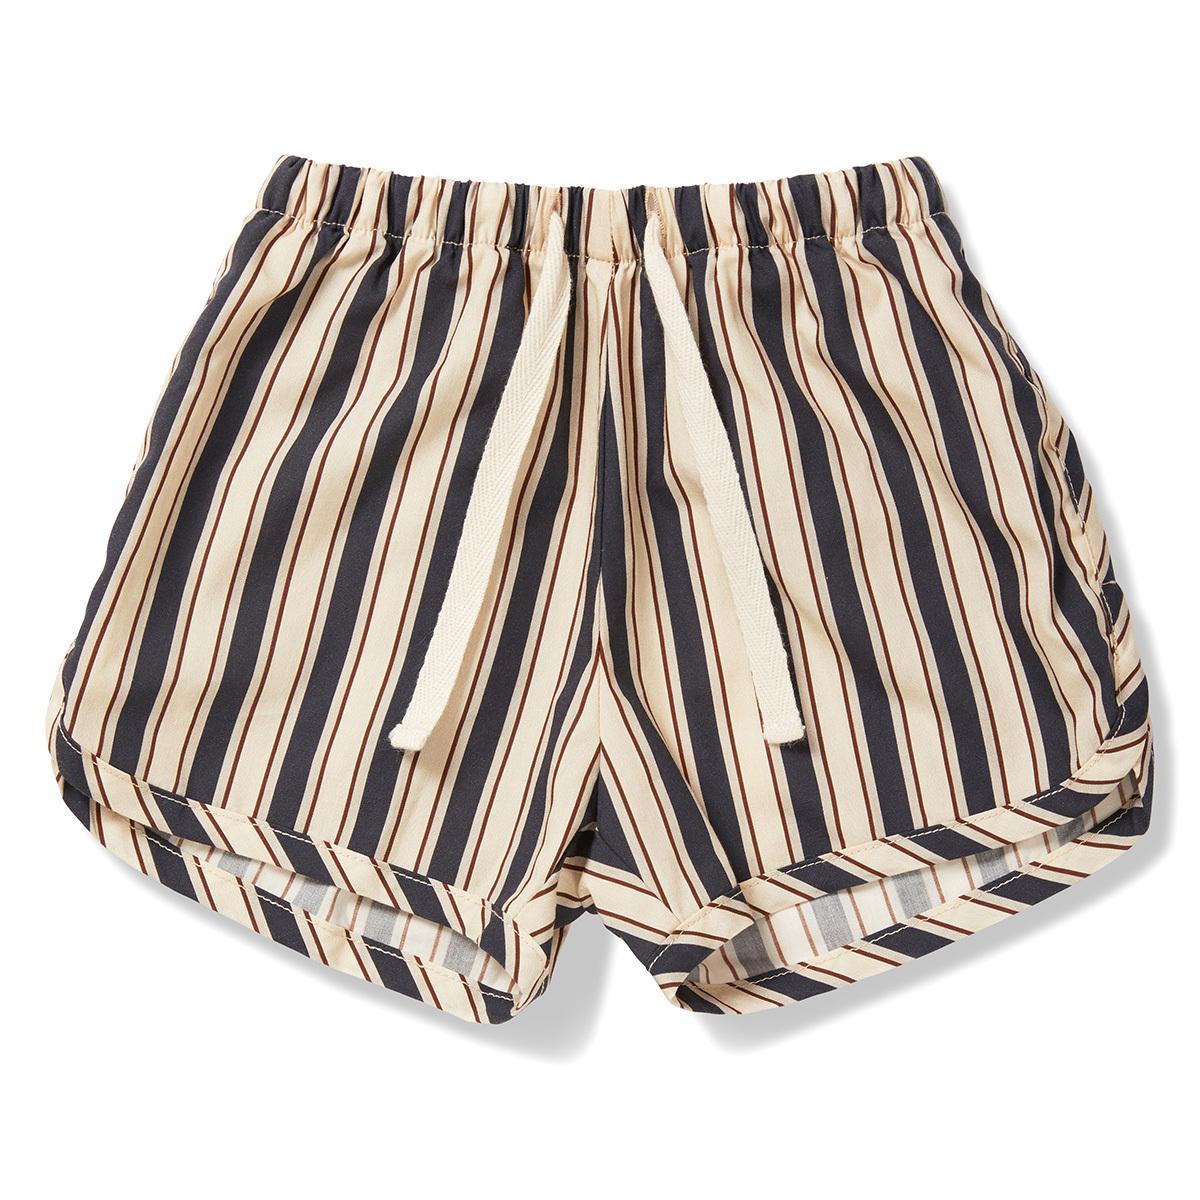 Bas bébé Short Verbena Navy Stripes - 3 Ans Short Verbena Navy Stripes - 3 Ans